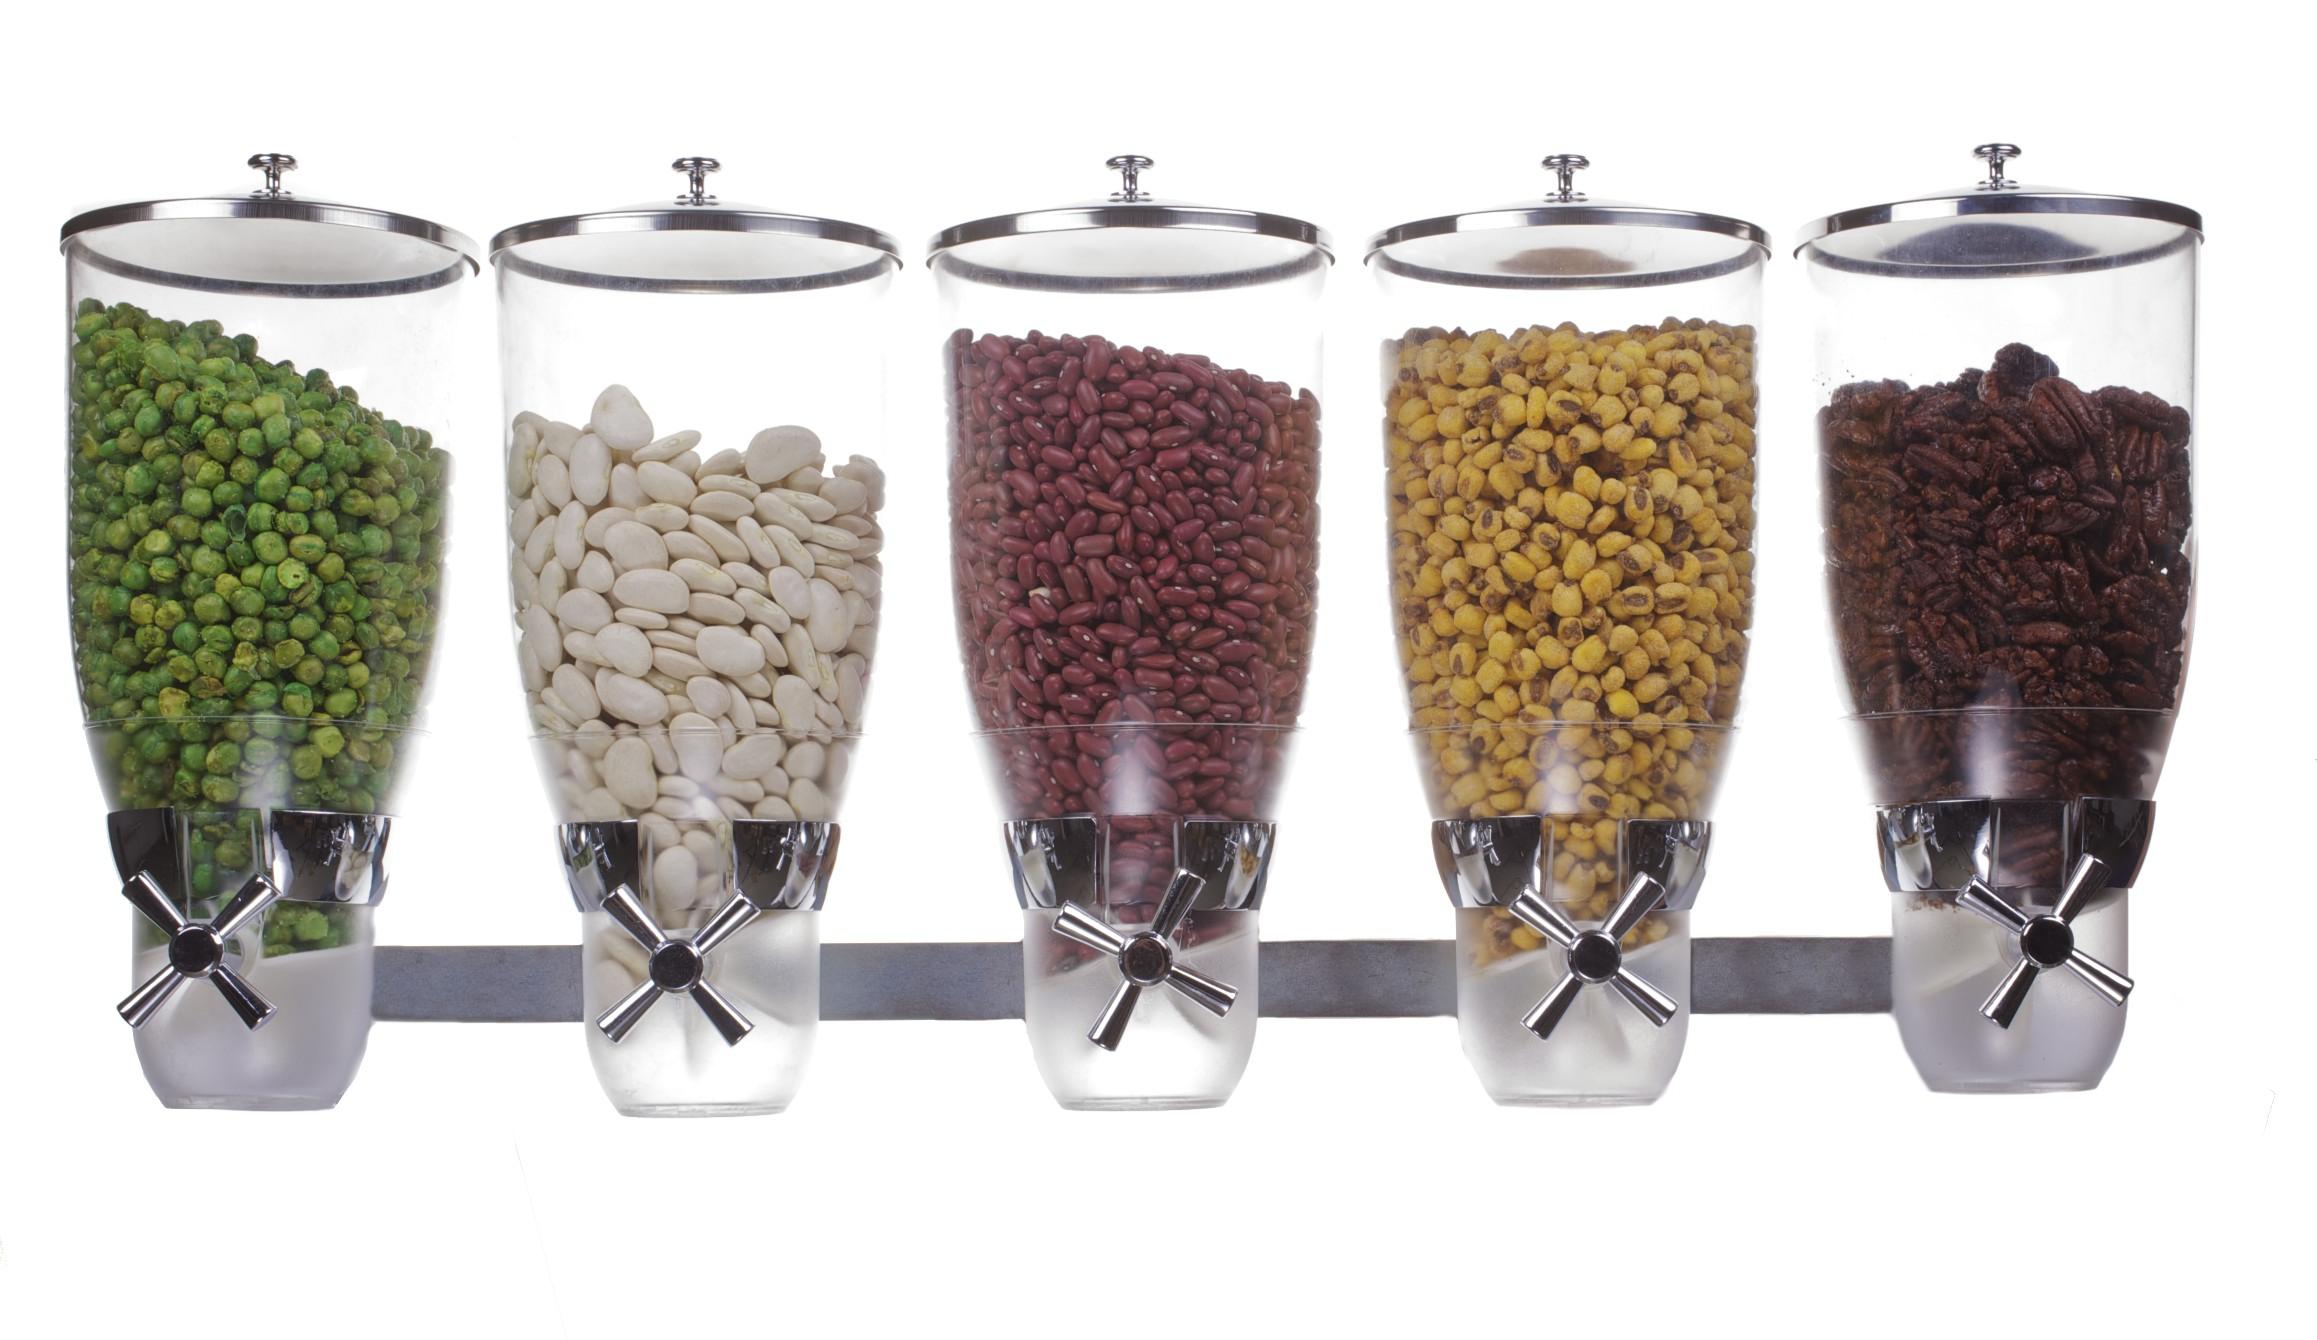 hcd5307-natural-food-dispenser.jpg